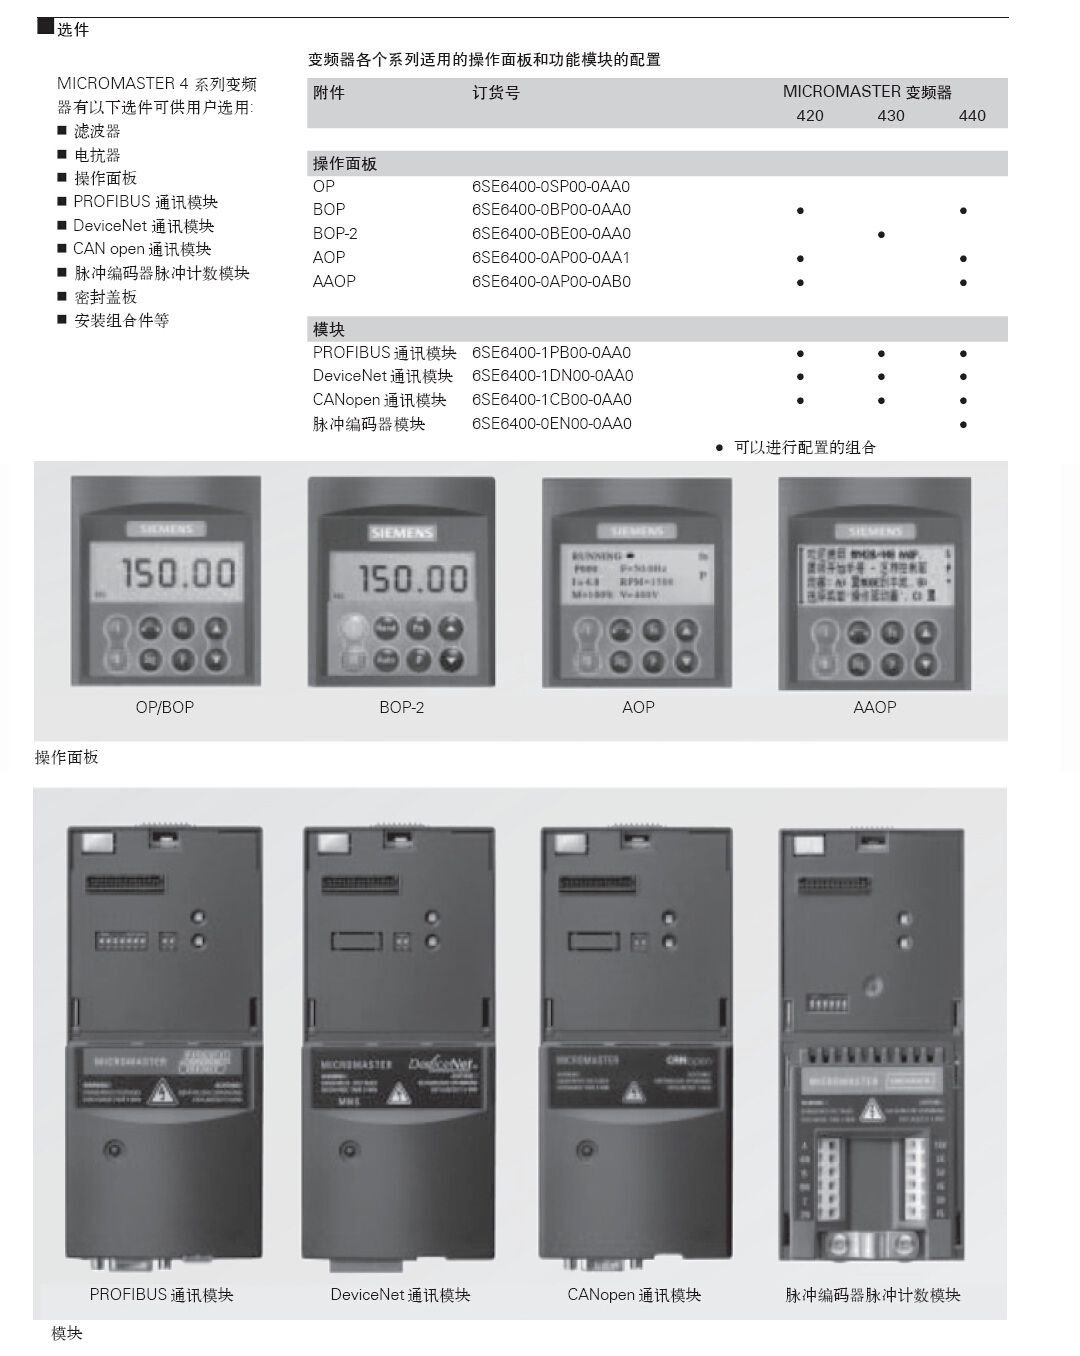 l 最新的 IGBT 技术、数字微处理器控制、高质量的矢量控制系统 l 磁通电流控制 (FCC) 改善动态响应,并且优化电动机的控制 l 线性 V/F 特性、平方 V/F 特性、多点 v/f 特性 (可编程V/F 特性) l 力矩控制、捕捉再起动、滑差补偿、动态缓冲 l 在电源中断或故障跳闸以后,自动再起动 l 可以由用户定义的自由功能块,实现逻辑运算和算术运算的操作 l 用于定位控制的减速斜坡函数曲线 l 变频器具有内置的高品质PID 控制器 (具有参数自整定功能),可用于一般的过程控制 l 可编程的加